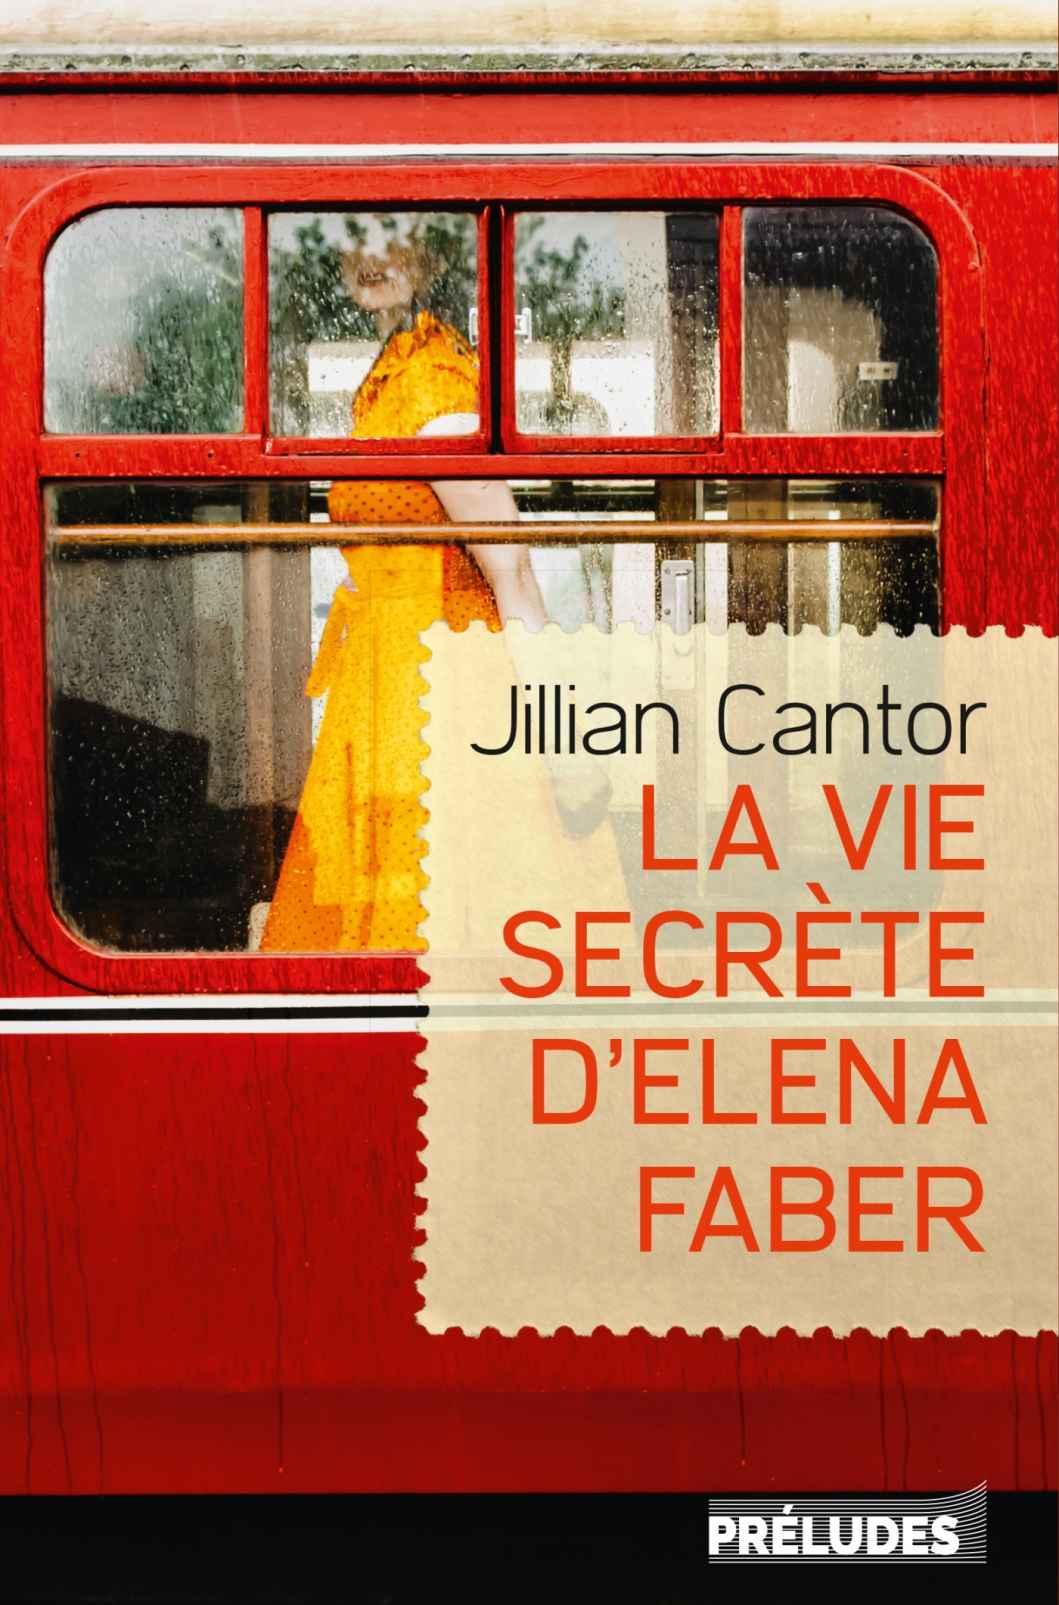 la-vie-secrete-d-elena-faber-jillian-cantor-avis-critique